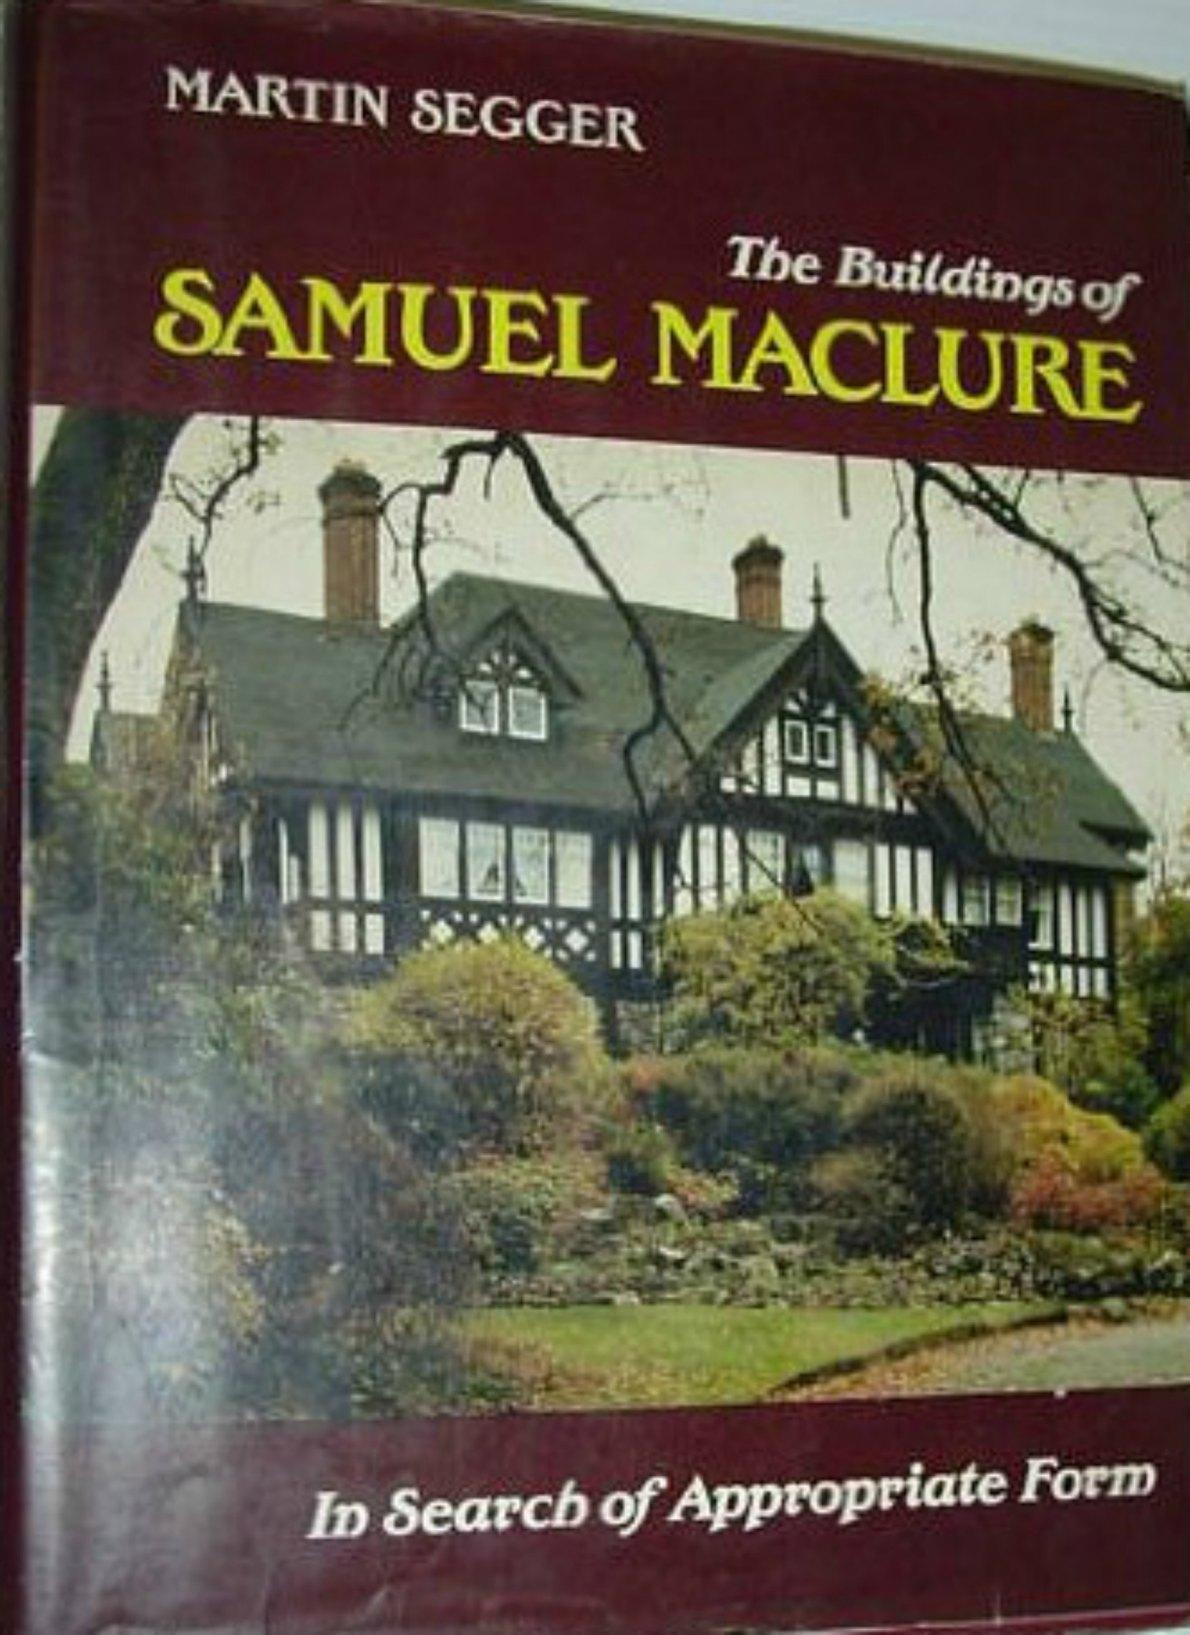 Martin_Segger-Samuel_Maclure-VictoriaOnlineSightseeing-1662x2283